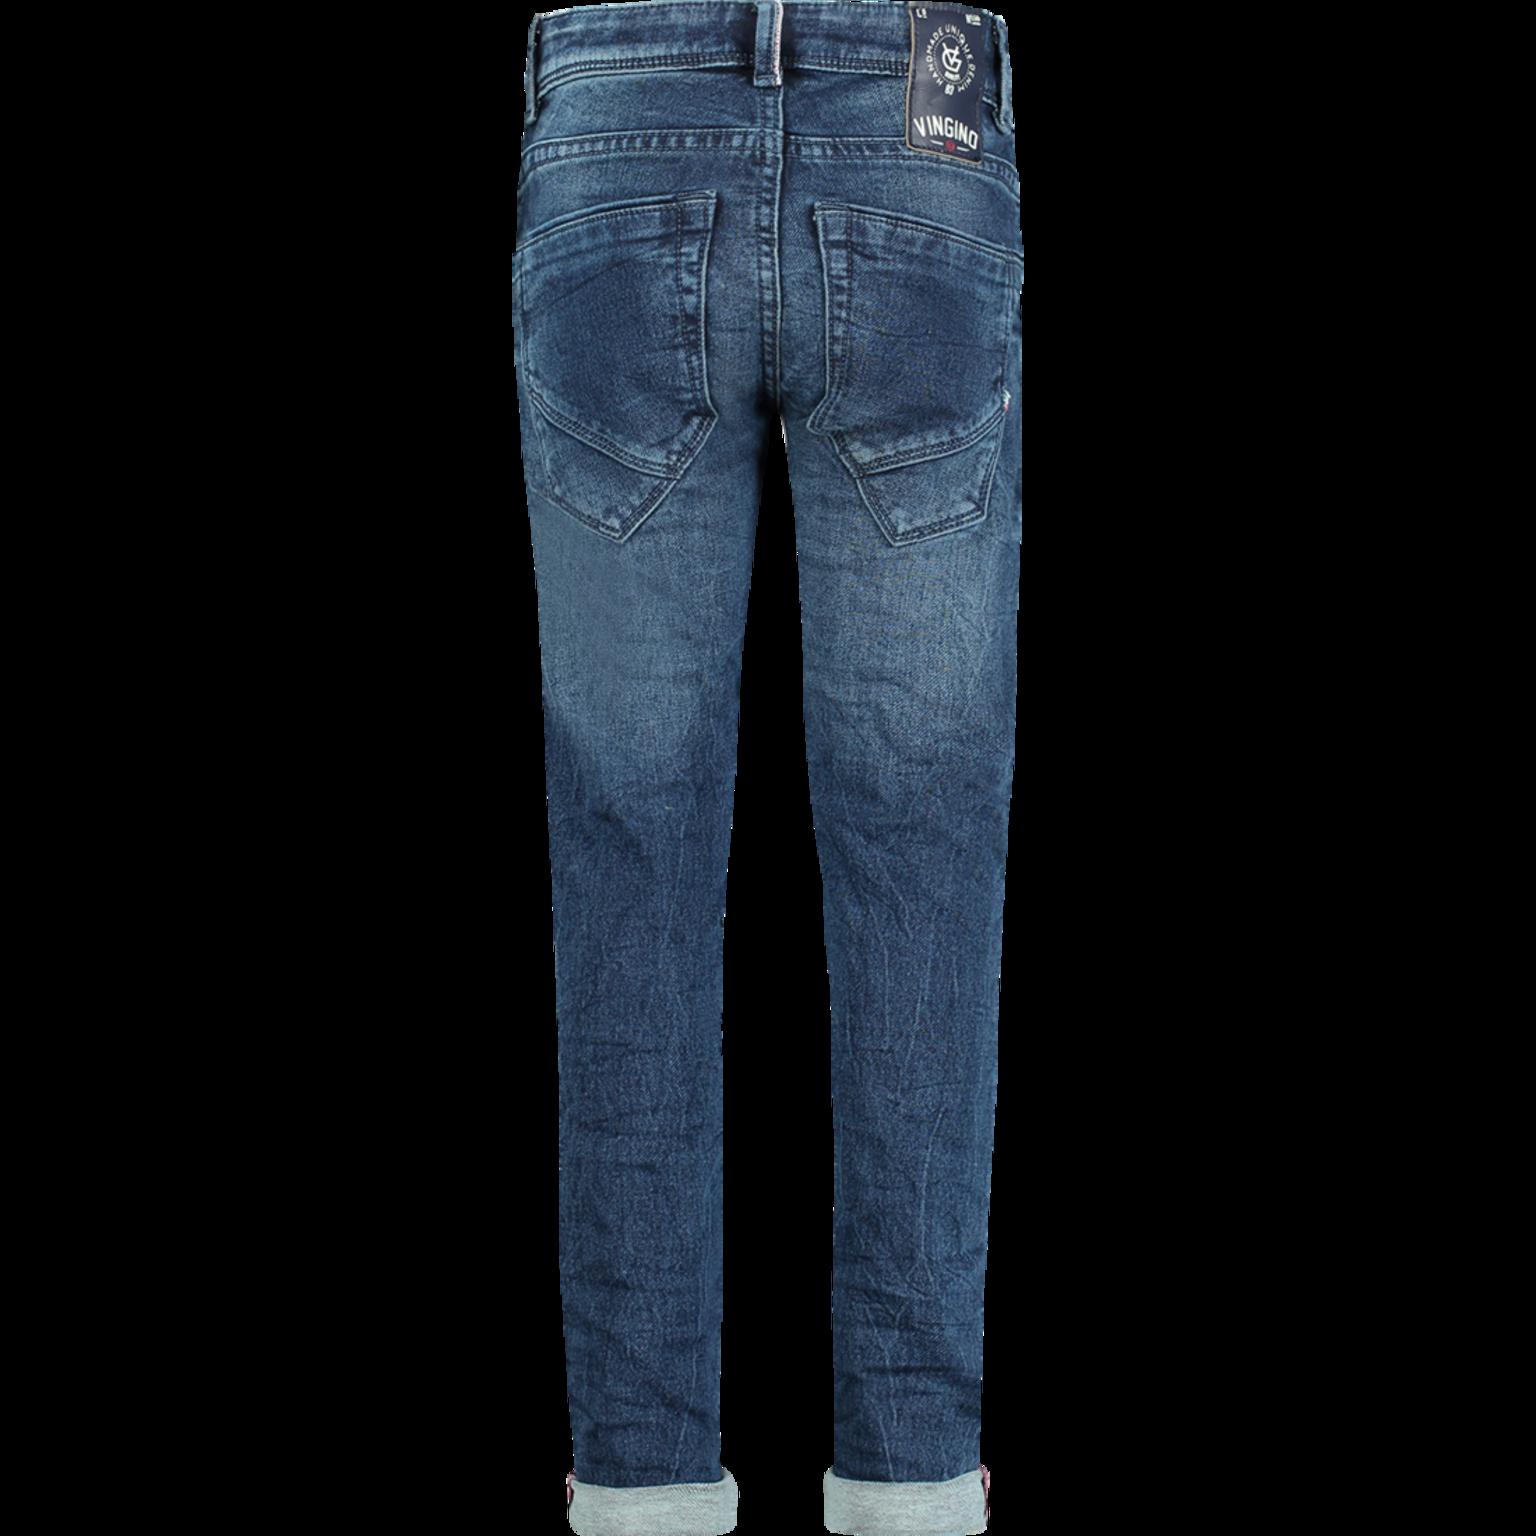 Vingino Jeans Hose boys Danny deep dark skinny | diefeinenkleinen.de